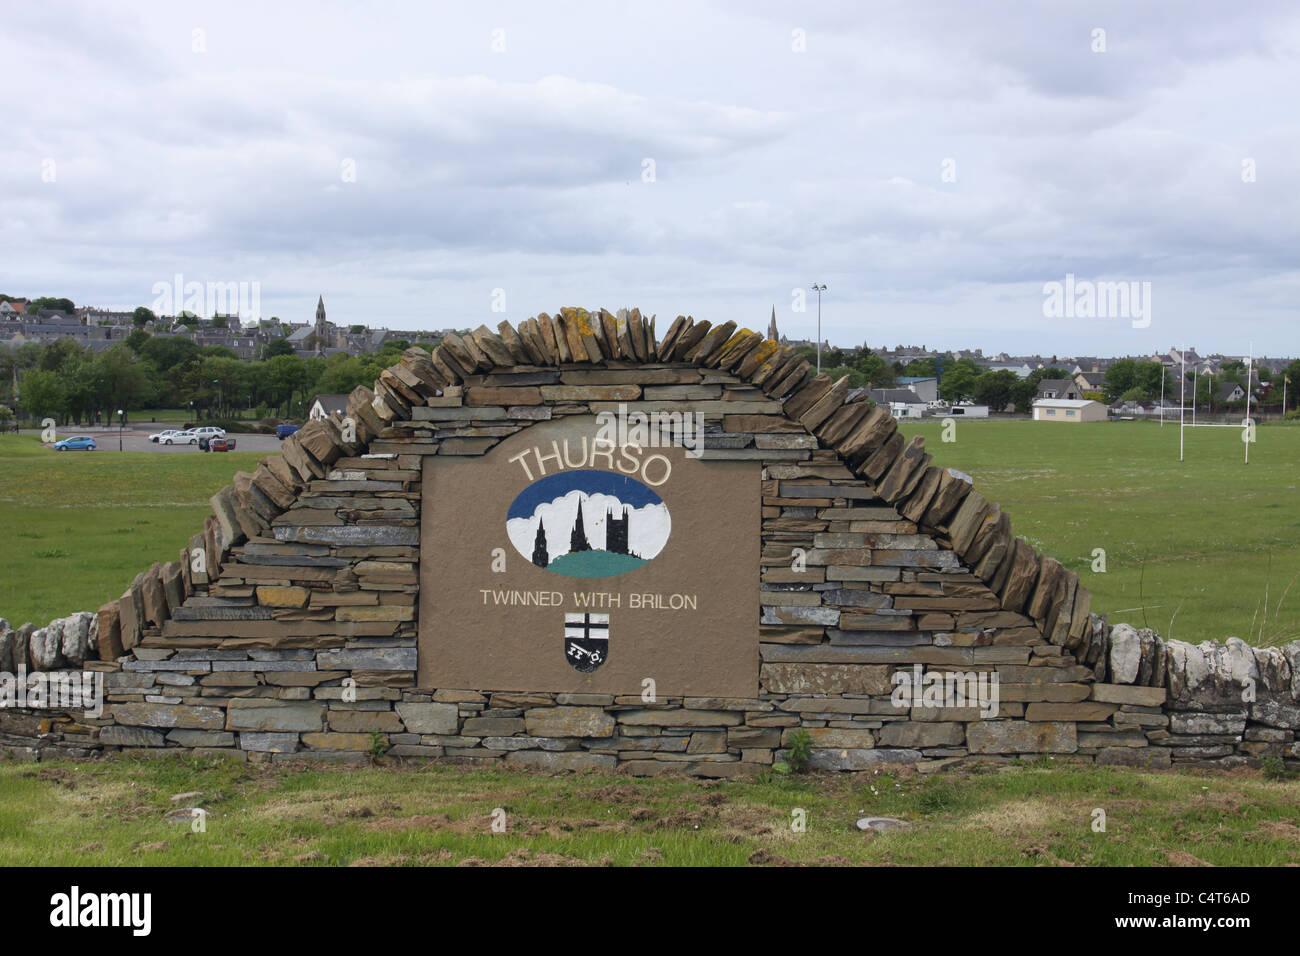 Thurso sign Caithness Scotland May 2011 - Stock Image